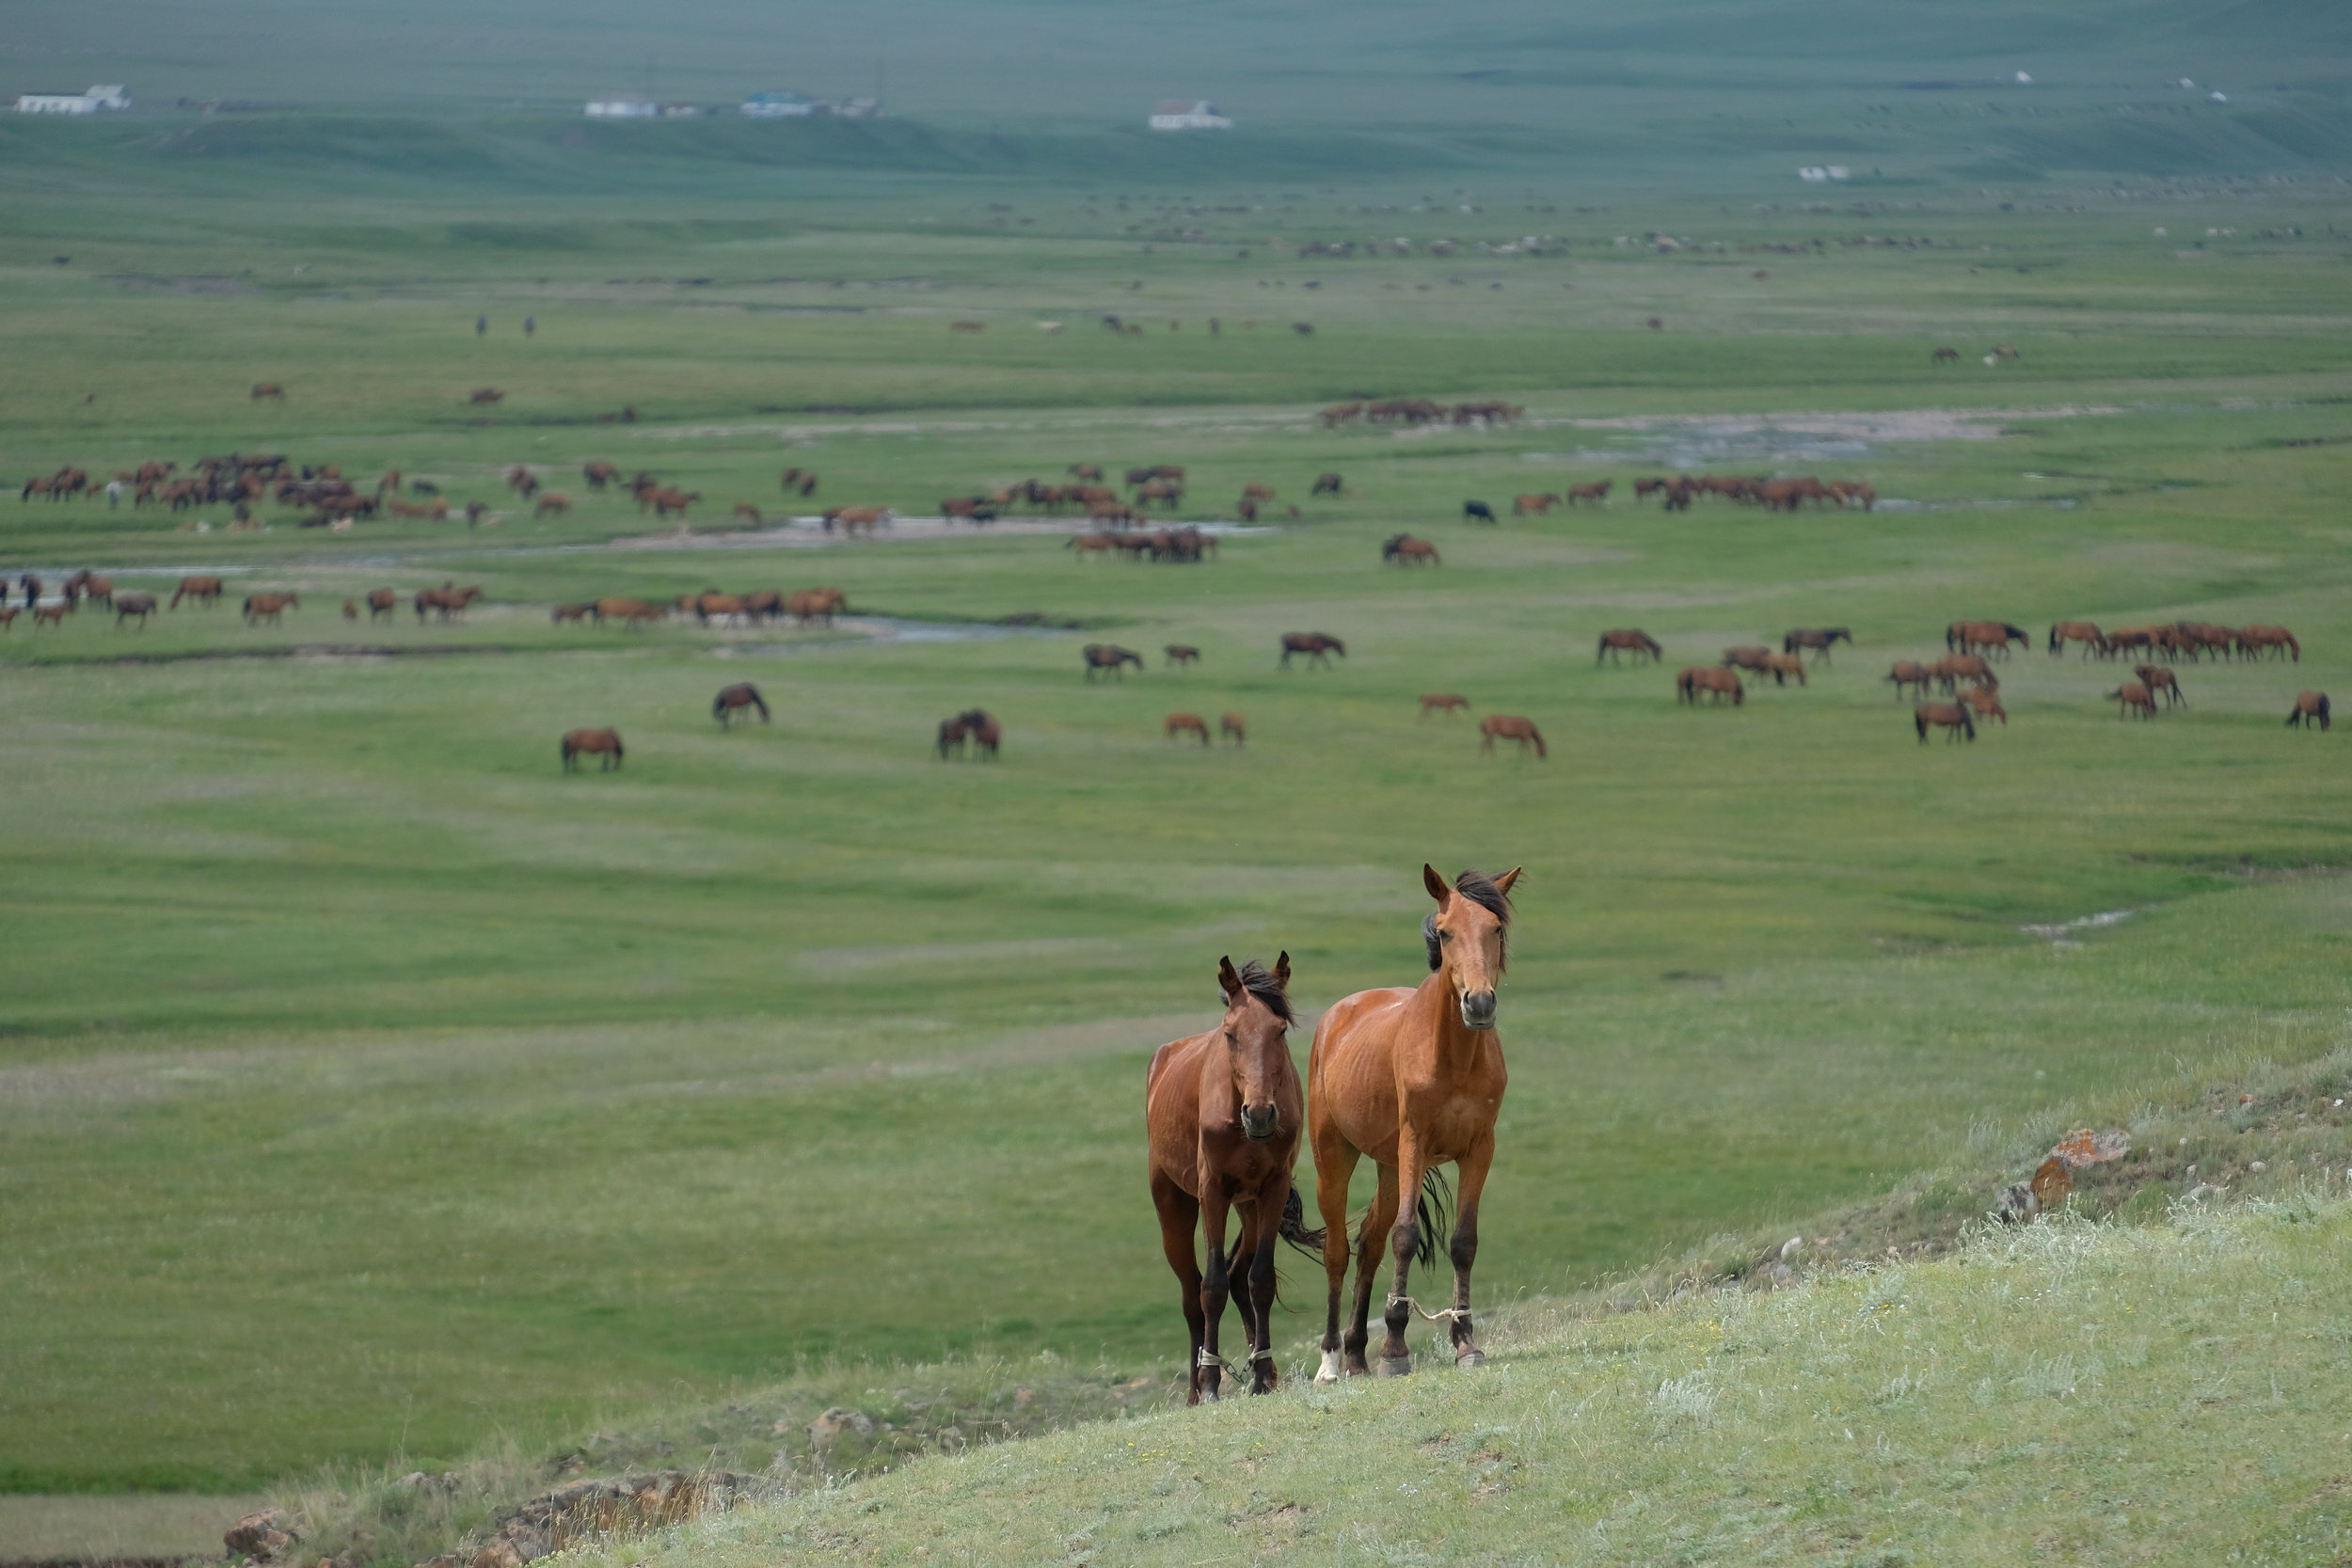 kazakh-corner-route-5232_34670791113_o.jpg